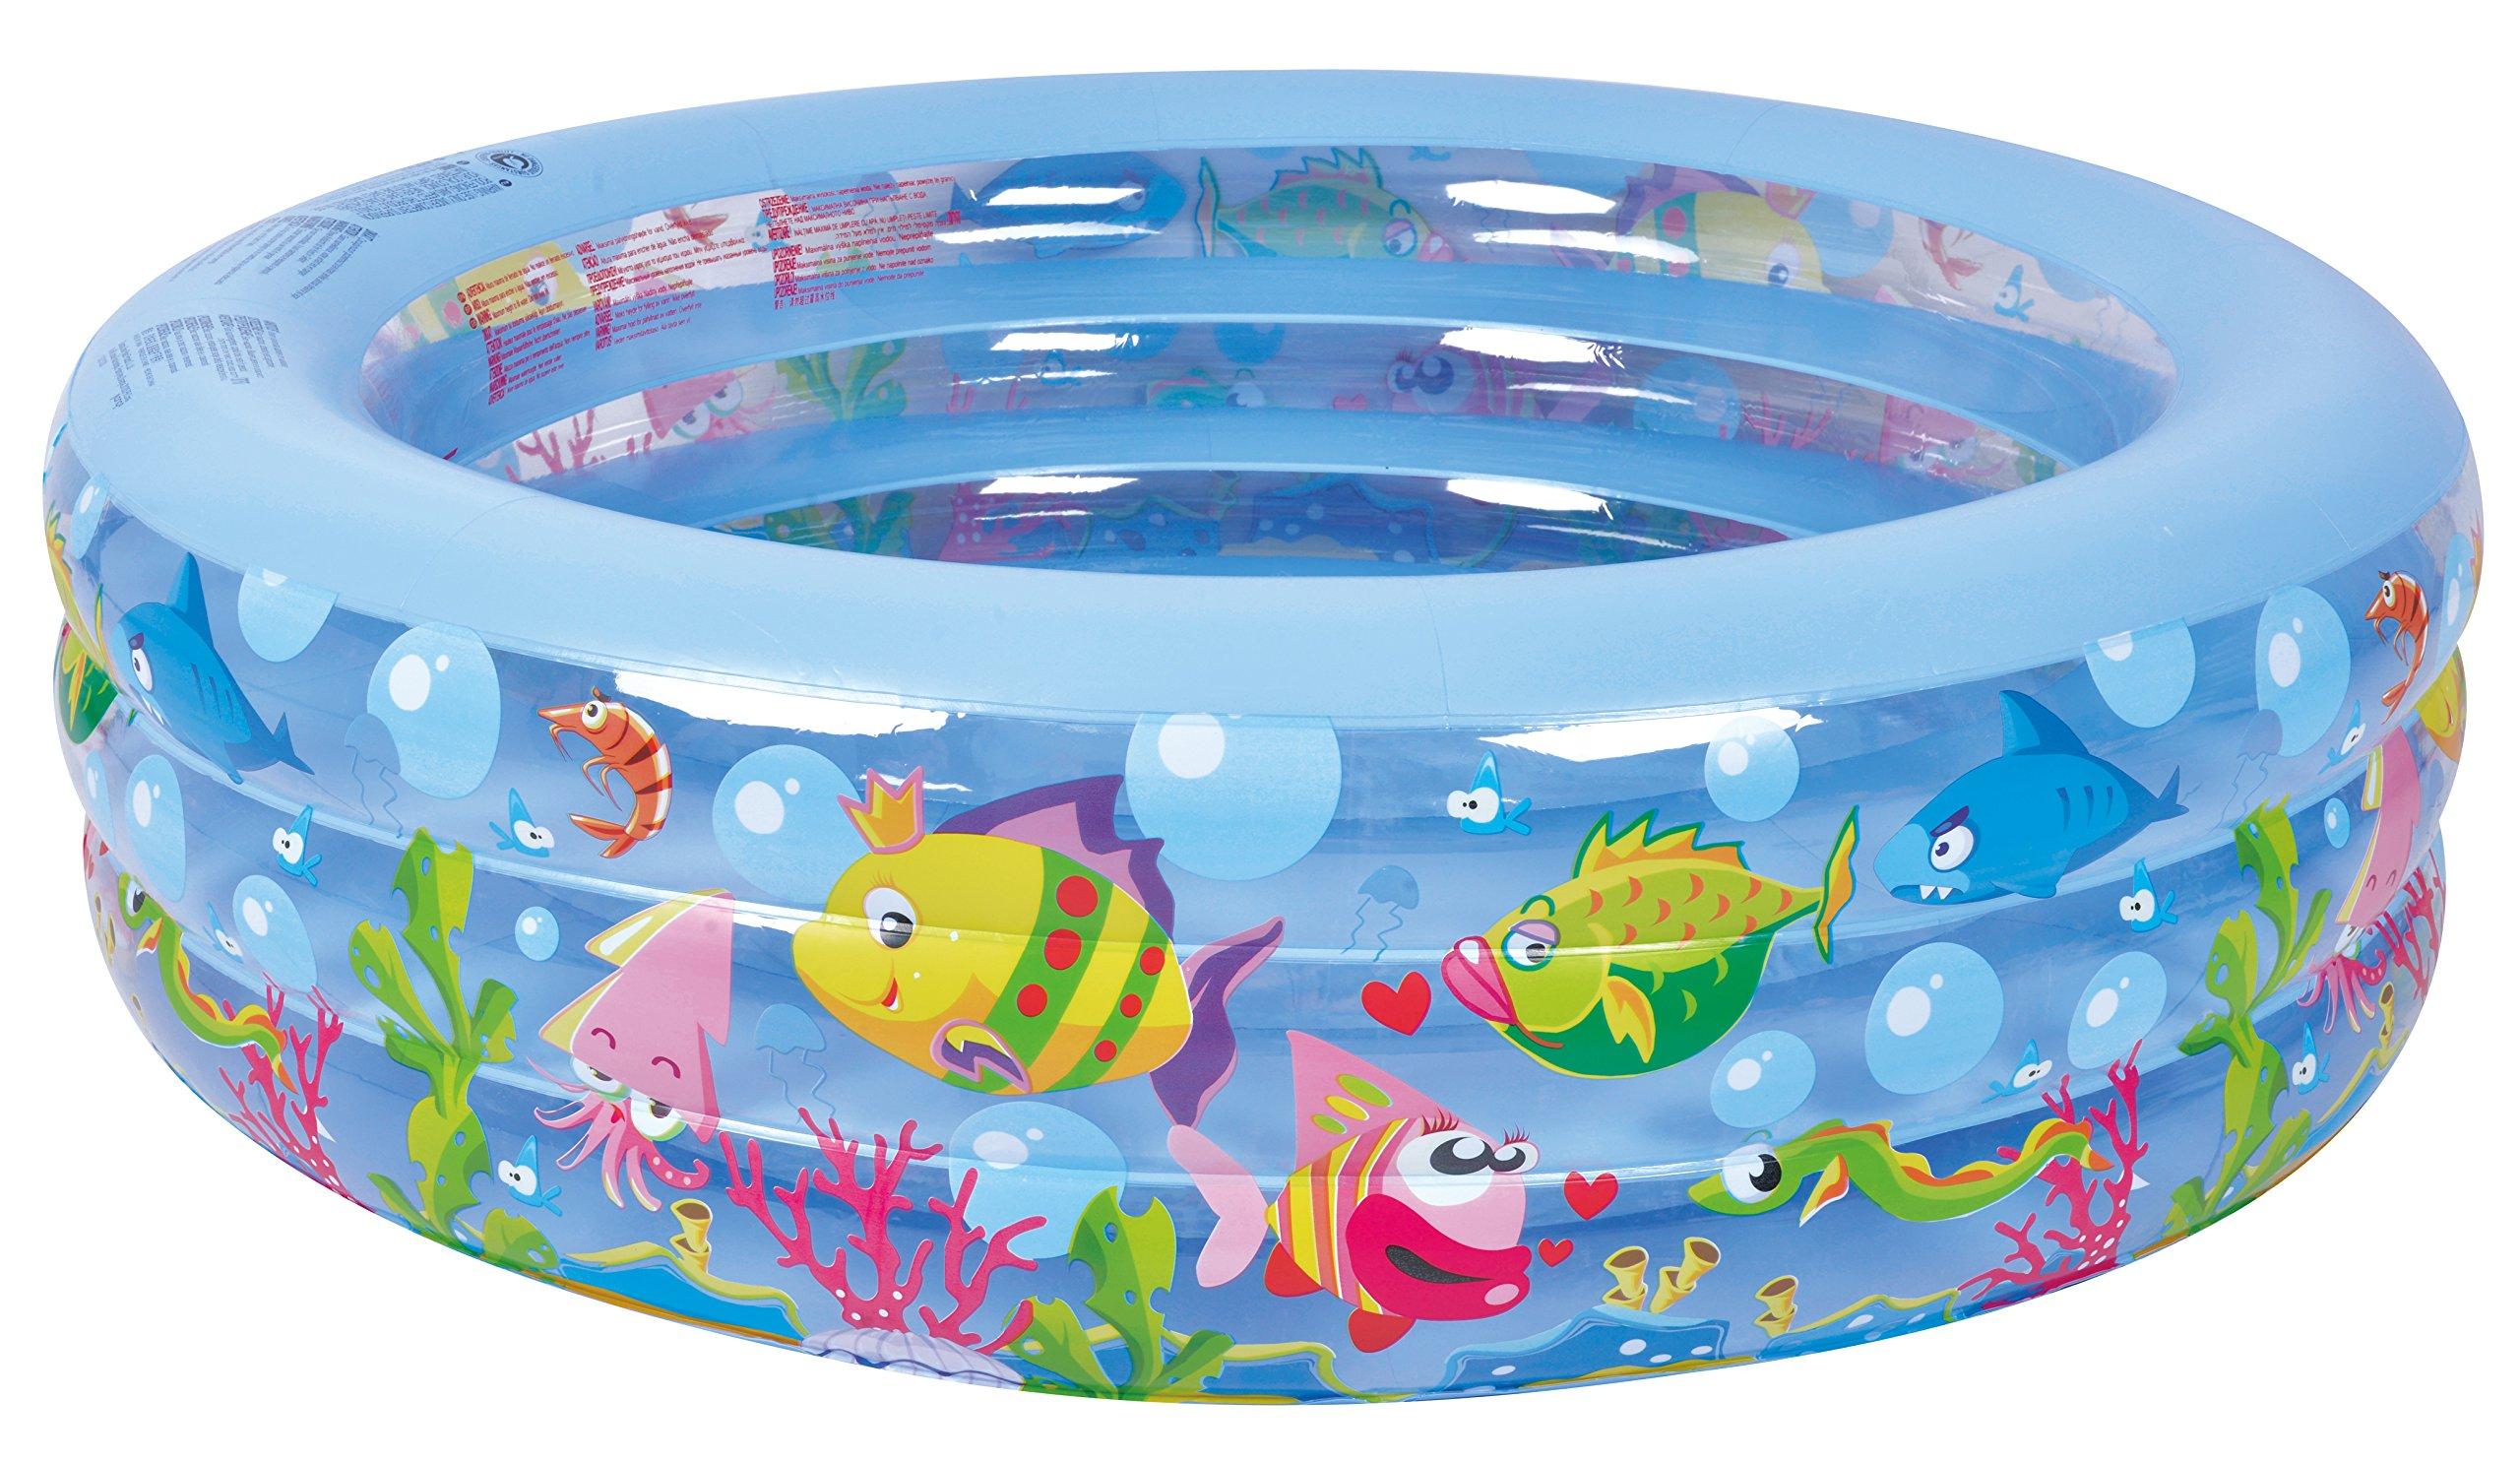 Jilong Summertime Kiddie Pool - Large Inflatable Pool for Kids with Aquarium Design - 185'' x 73'' x 20'' by Jilong